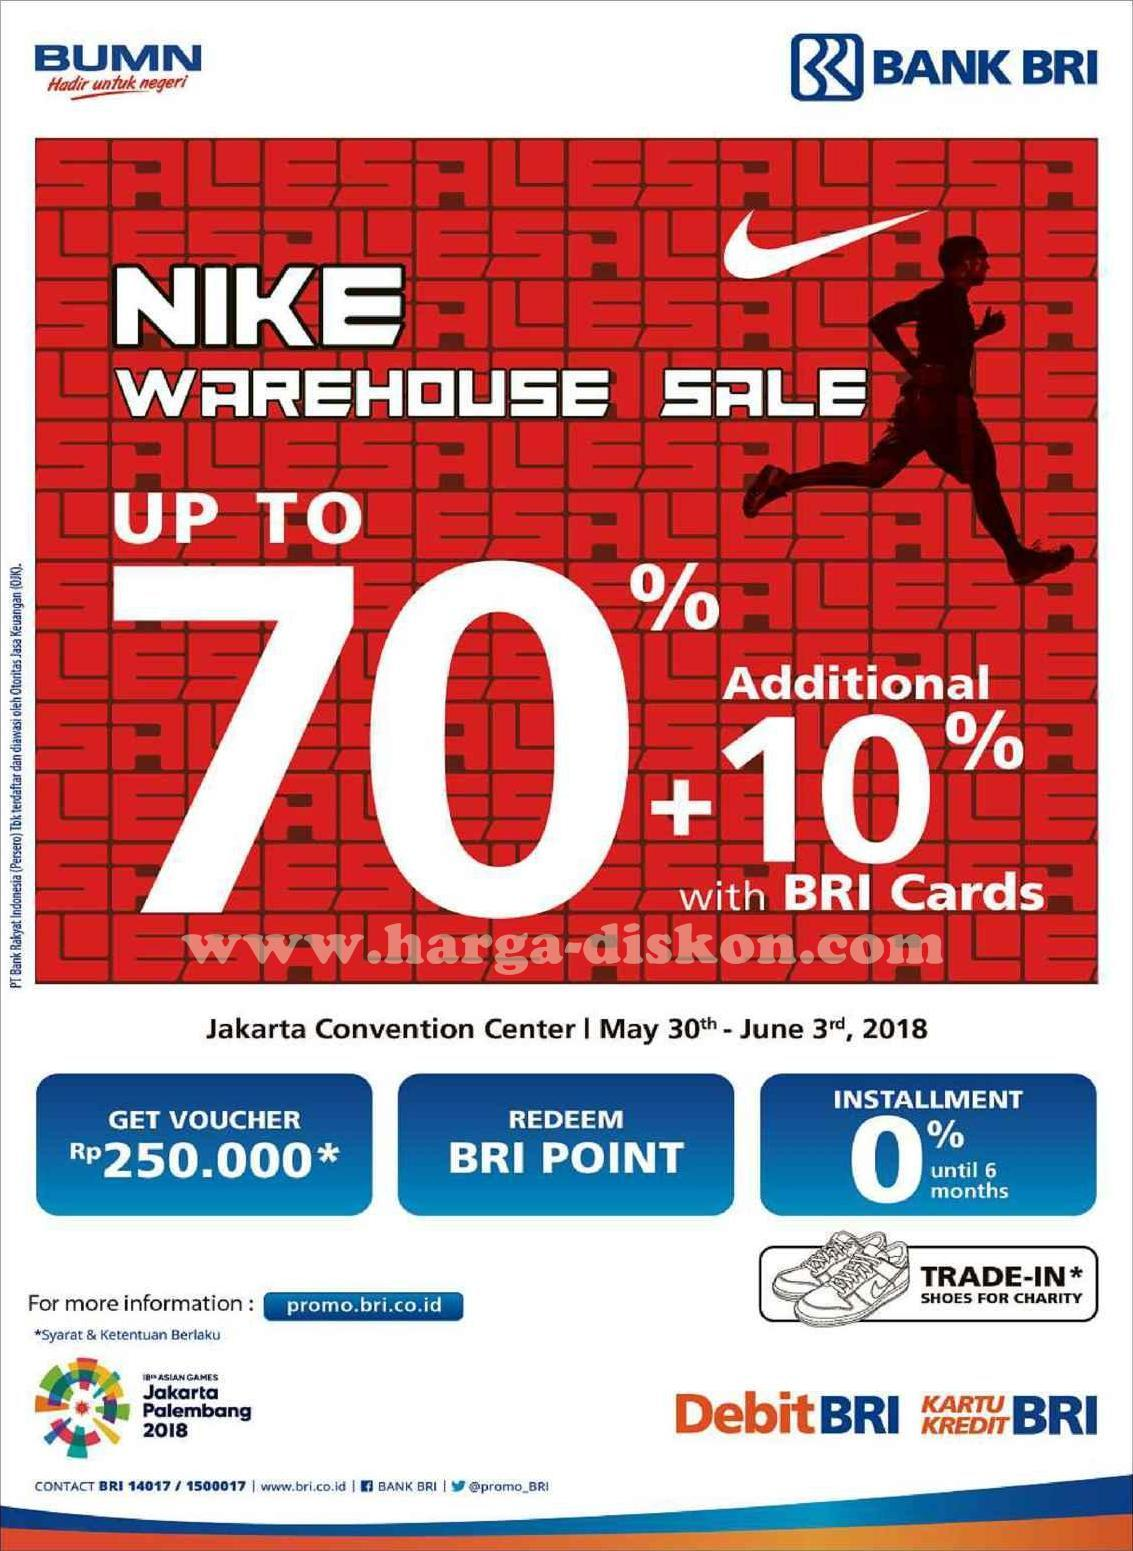 purchase cheap 083e7 10c6f Promo NIKE Terbaru Warehouse Sale Hemat Hingga 70% + Tambahan Diskon 10%  dengan Kartu BRI Dapatkan penawaran menarik voucher Rp250.000, Redeem point  BRI, ...